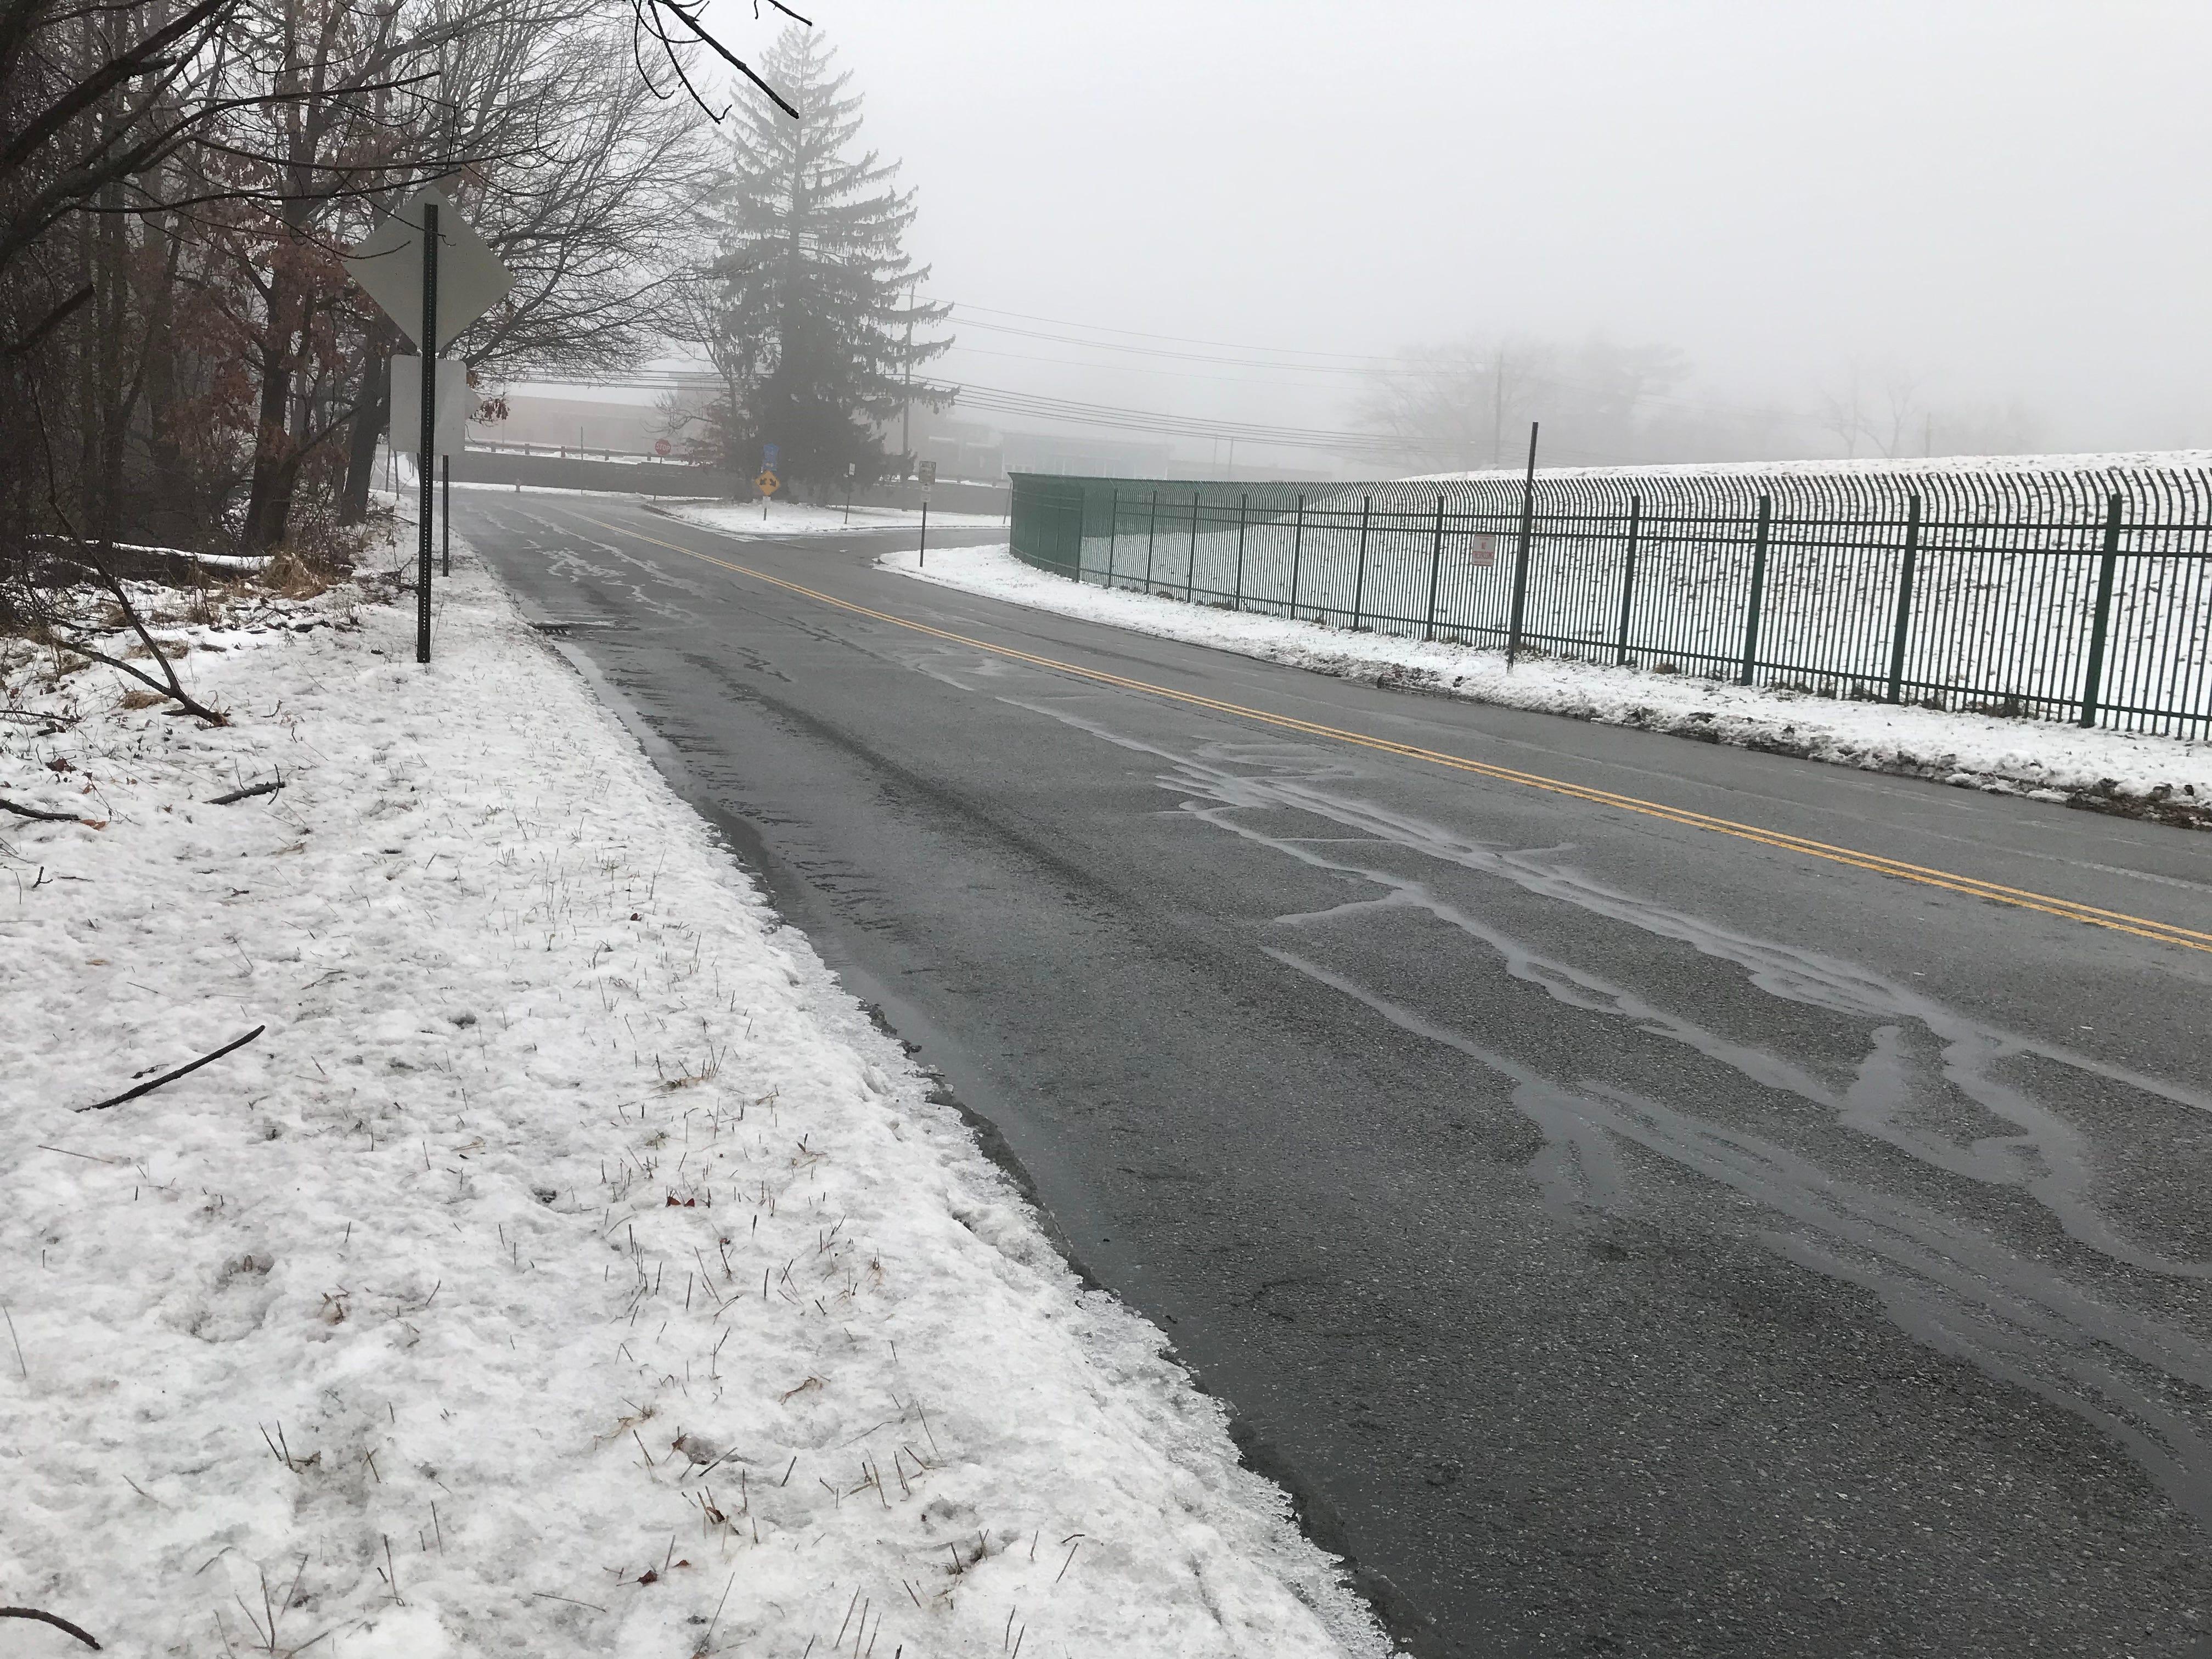 About an inch of rain and slush in Cedar Grove Sunday morning, Jan. 20, 2019.